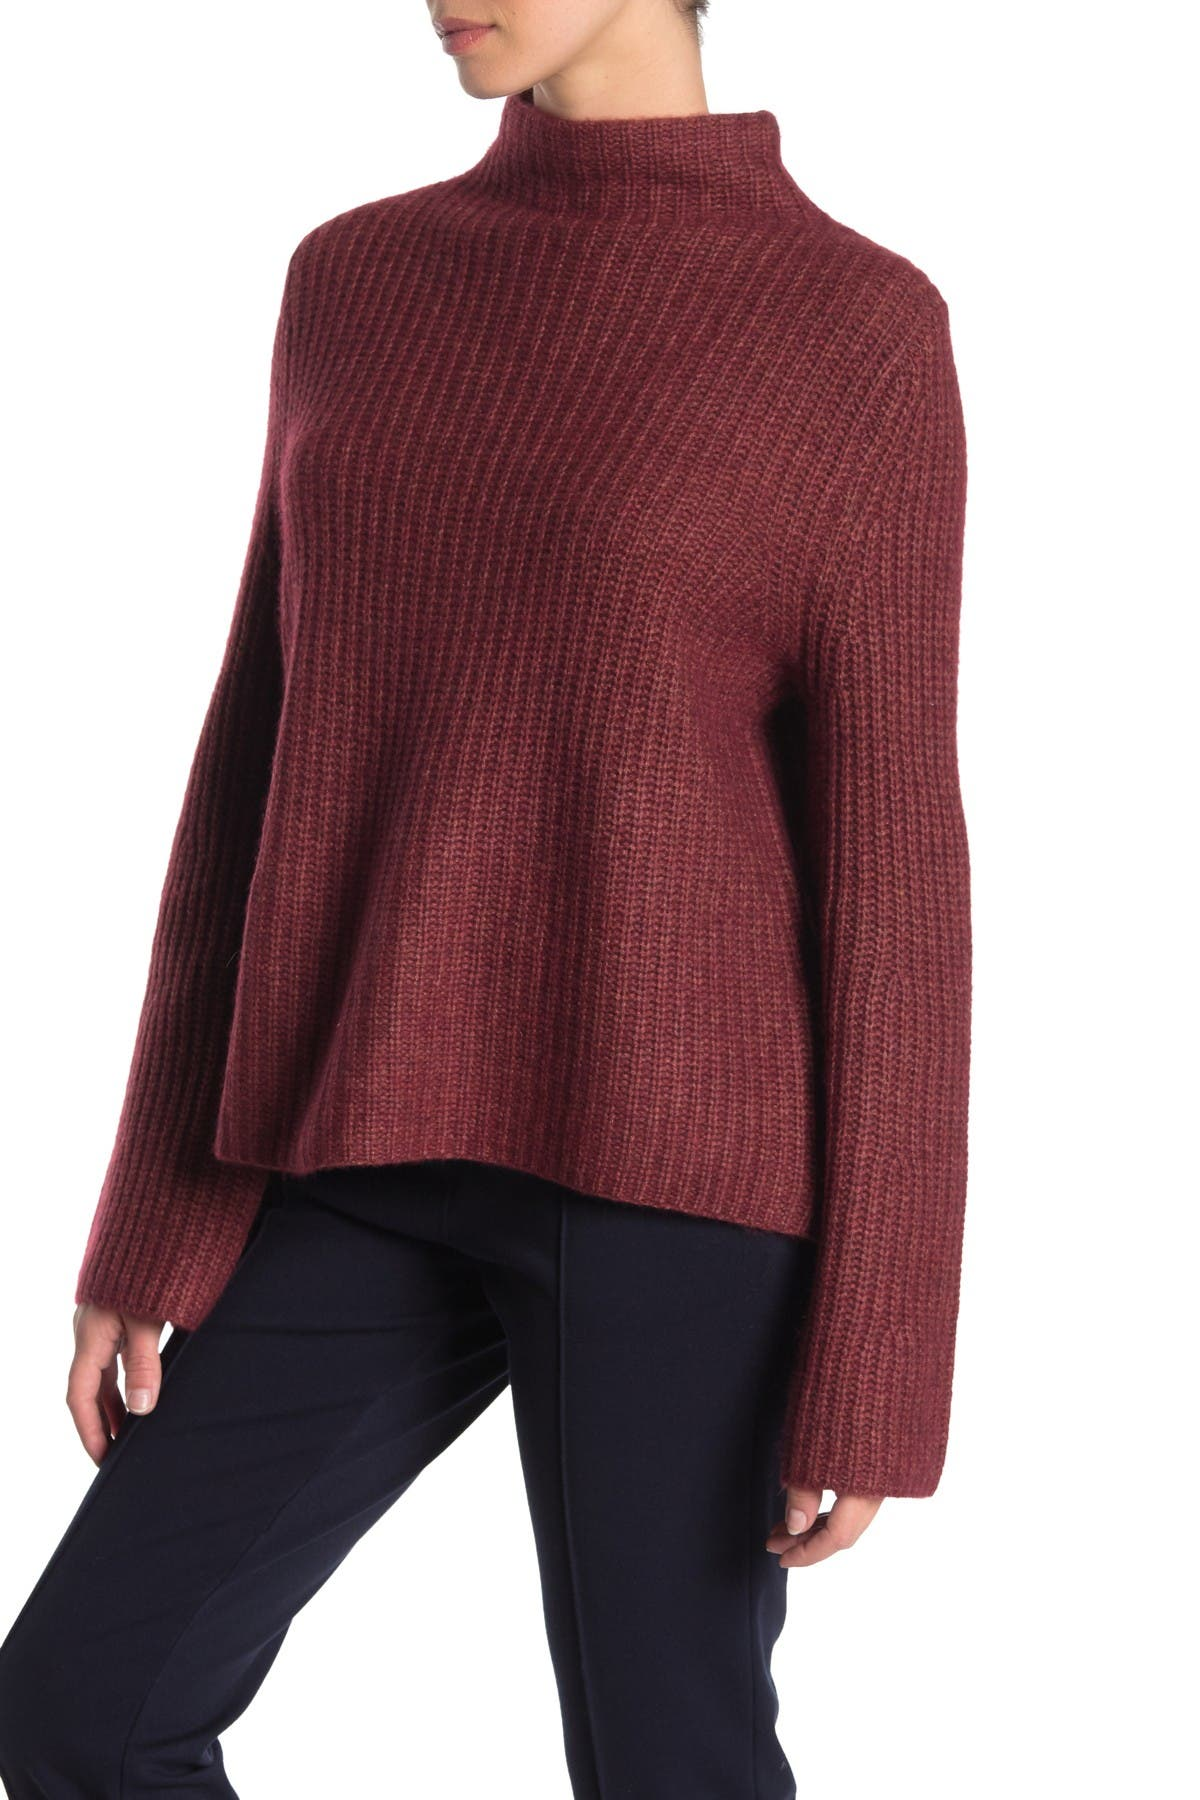 Image of 360 Cashmere Miranda Mock Neck Wool & Cashmere Sweater